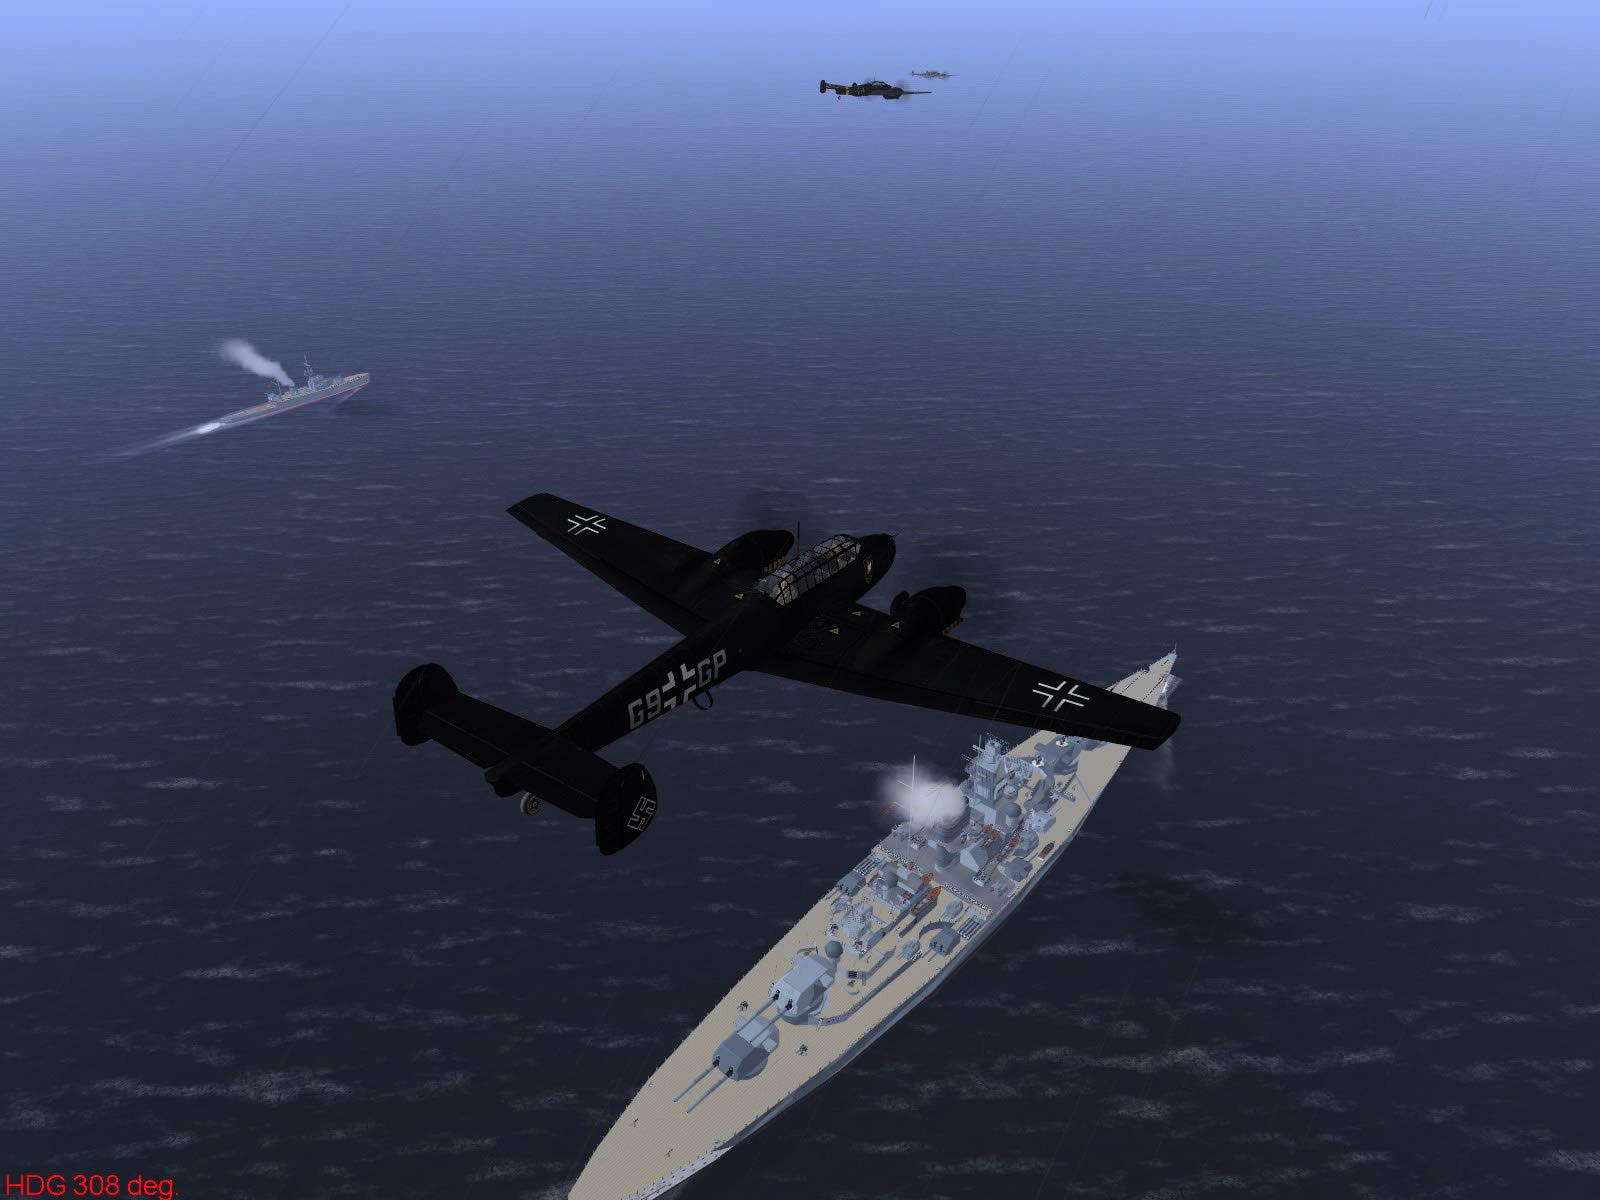 Ubisoft IL2 Sturmovik game version of Operation Donnerkeil 06